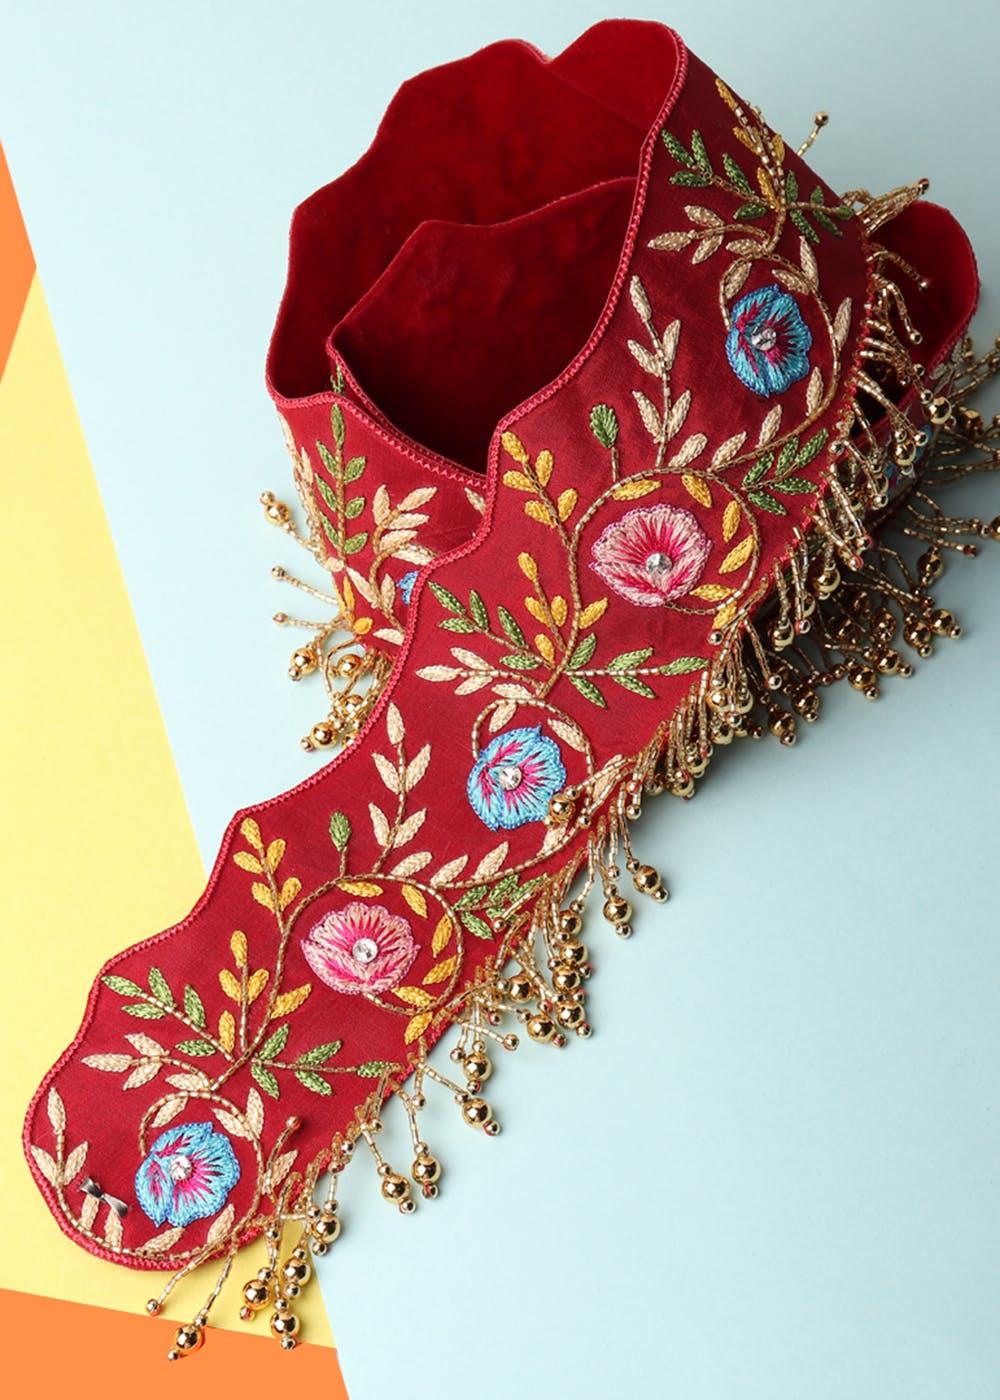 Floral Embroidered Red Waist Belt